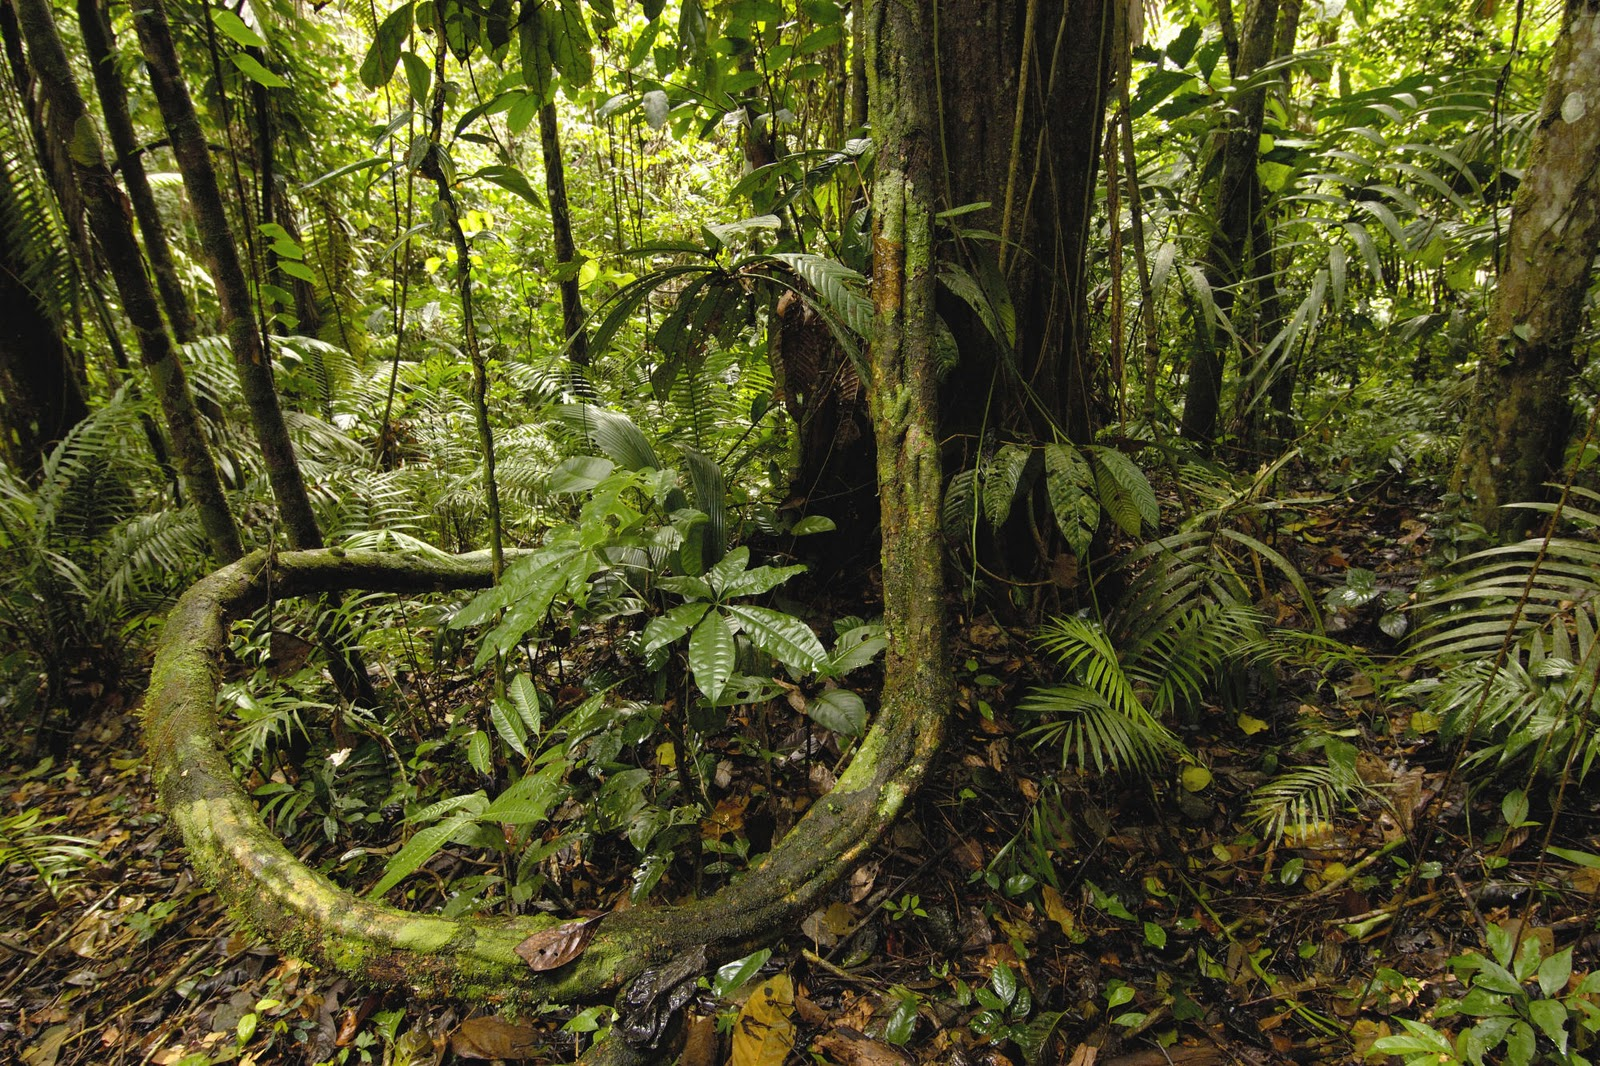 Interesting collection amazing amazon - Amazon rainforest animals wallpaper ...